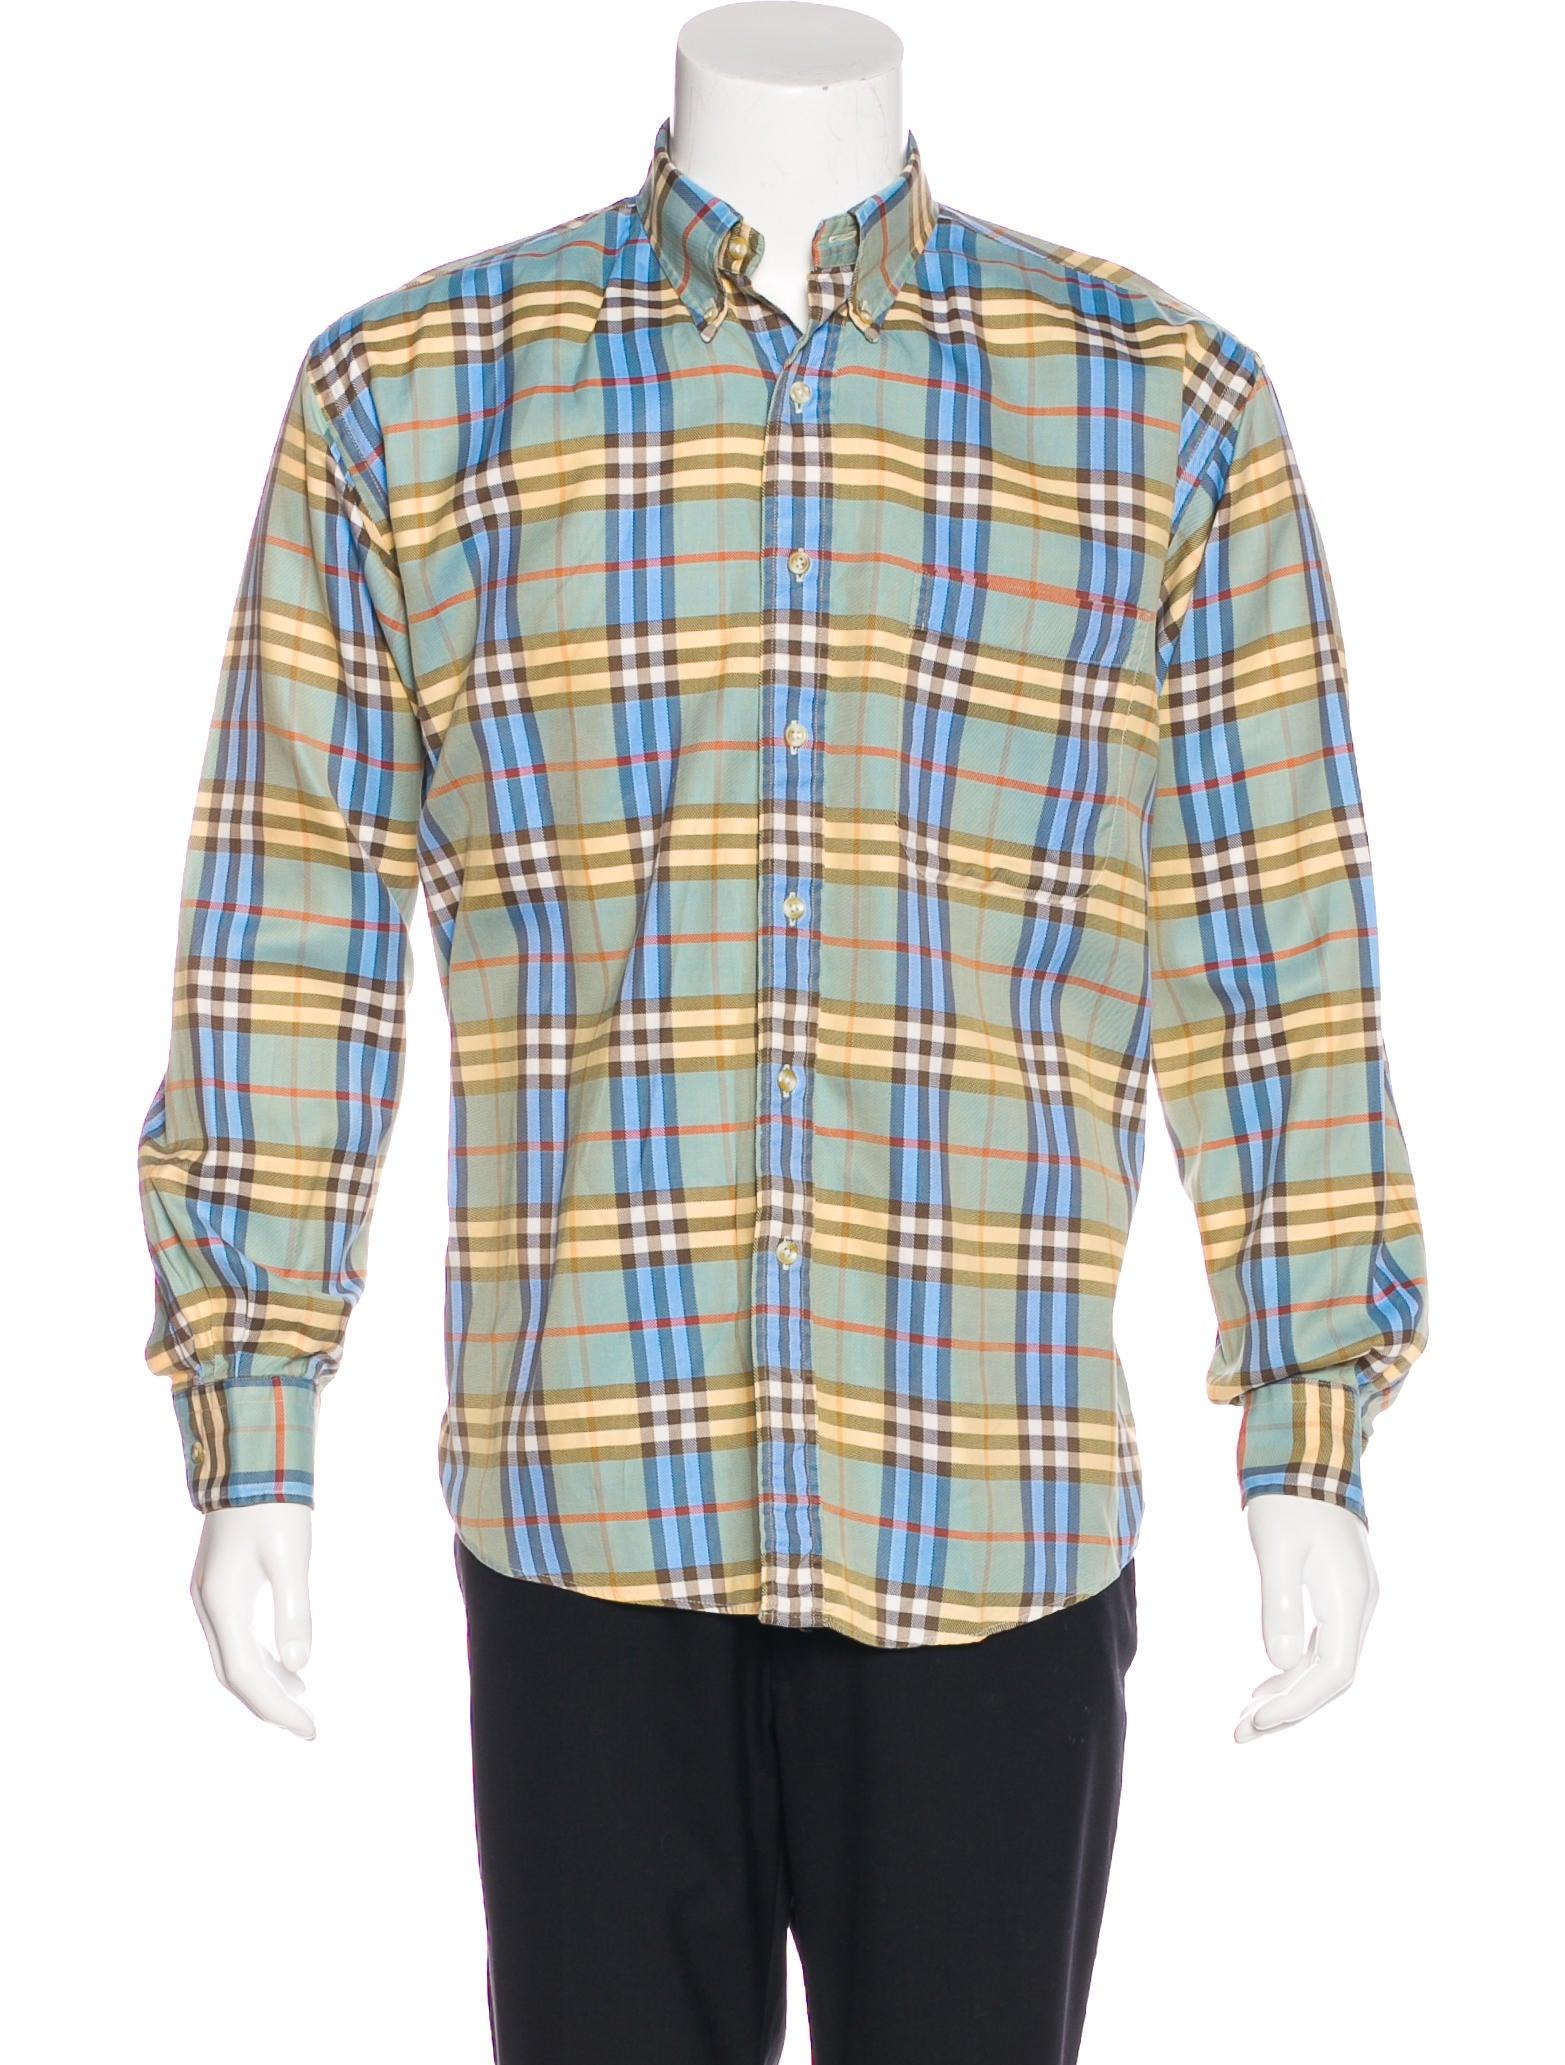 Burberry London Check Woven Shirt Clothing Wburl27747